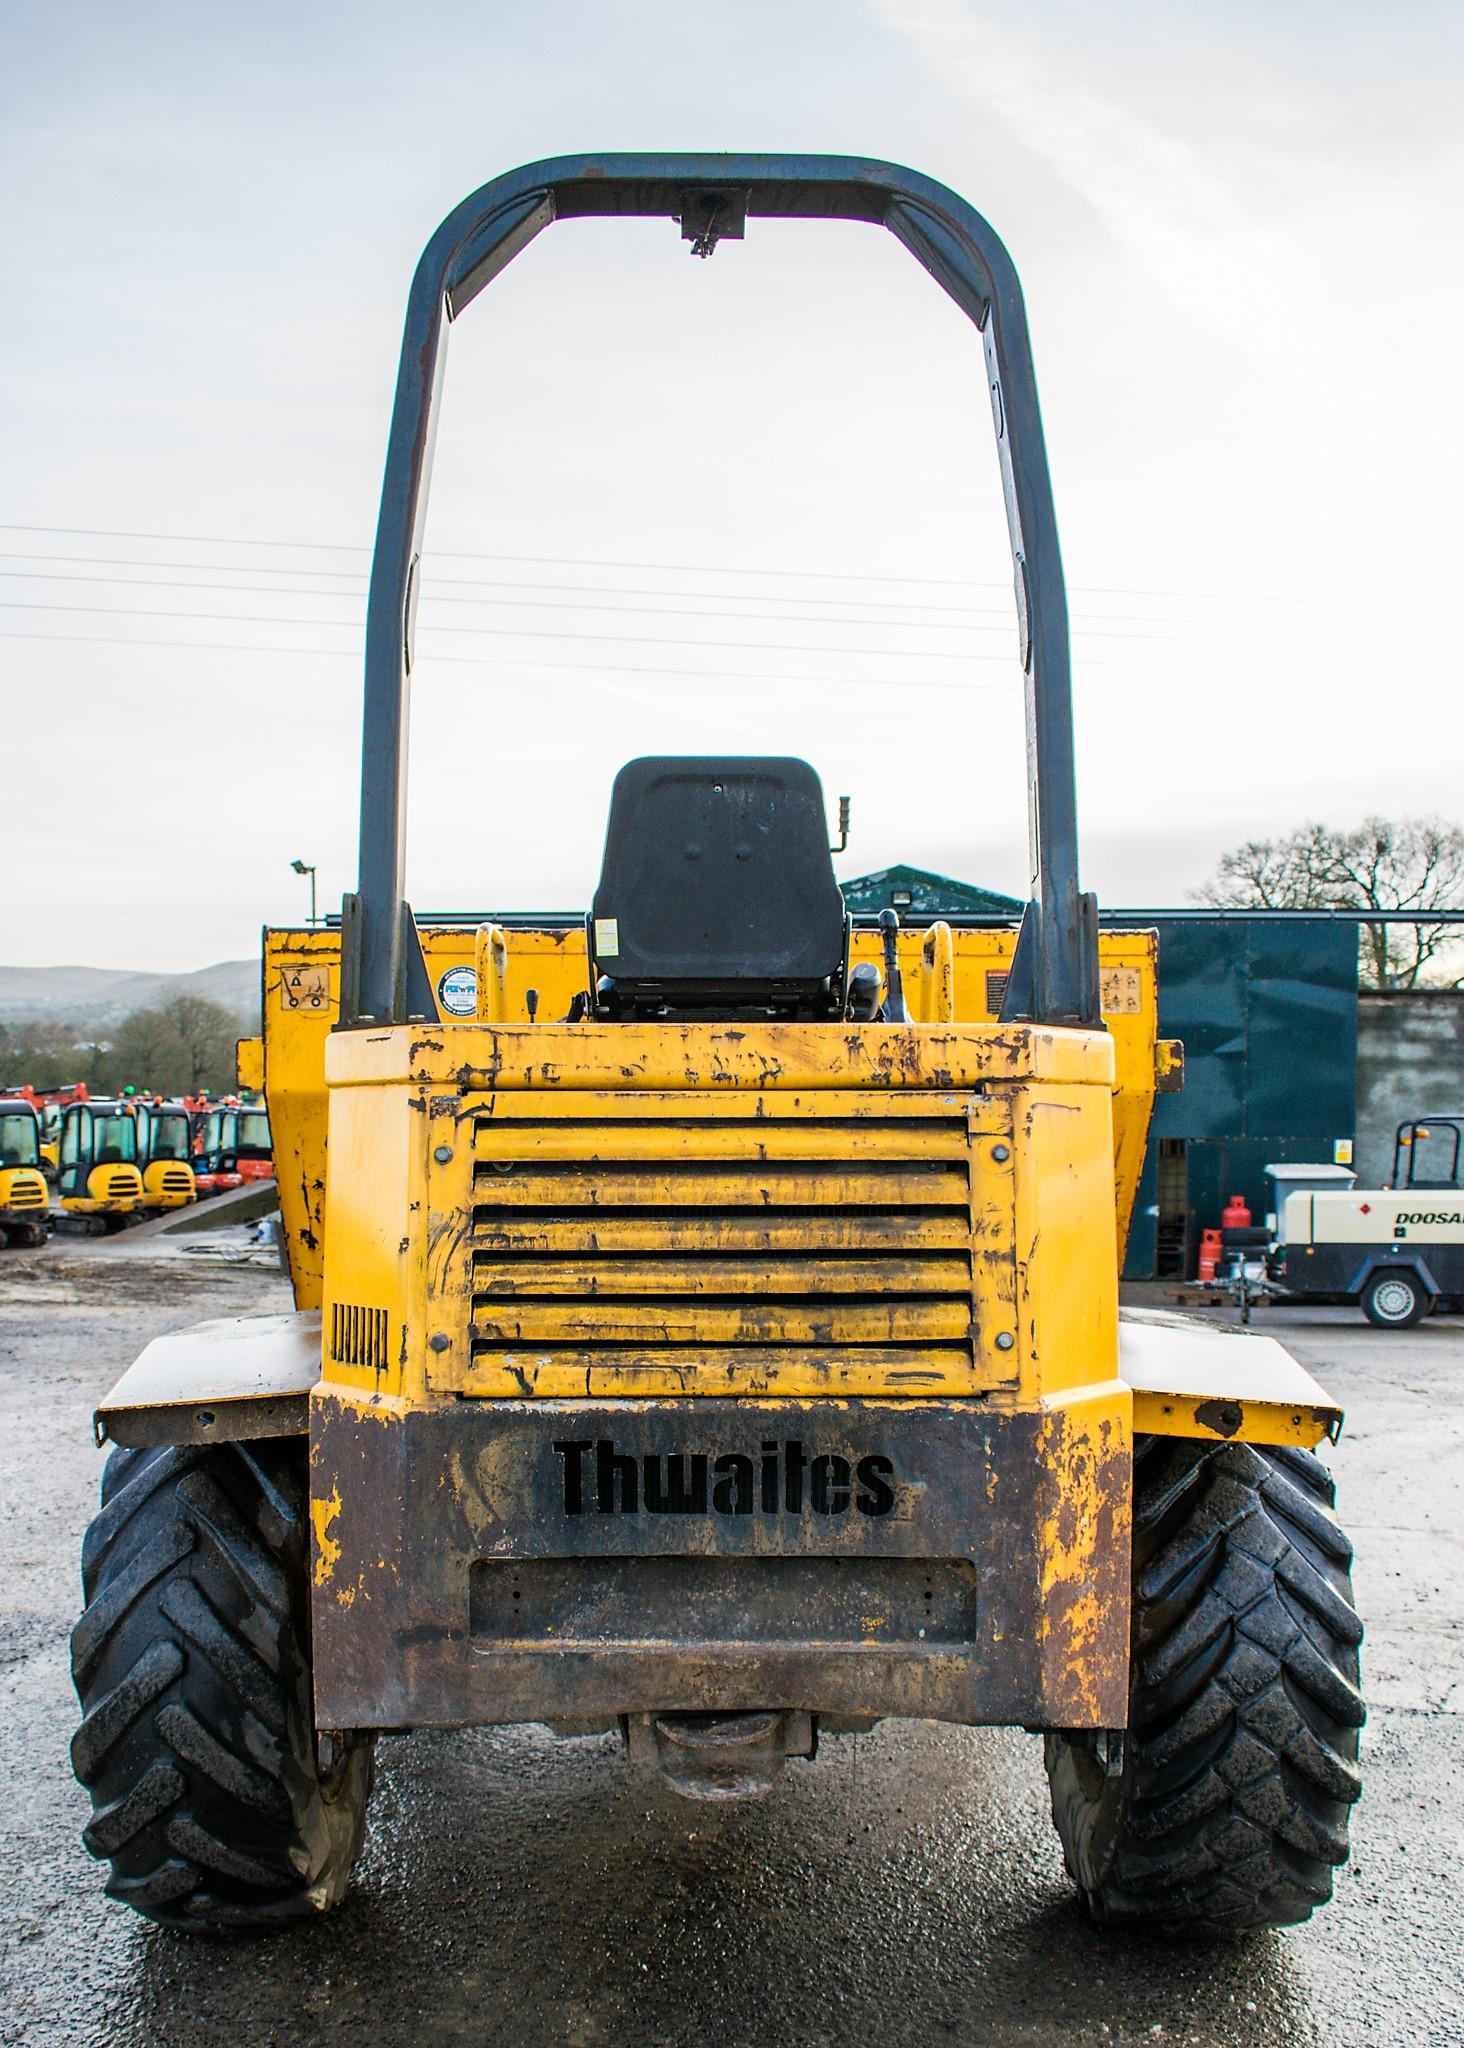 Lot 43 - Thwaites 6 tonne straight skip dumper Year: 2005 S/N: 7A6751 Recorded Hours: 4615